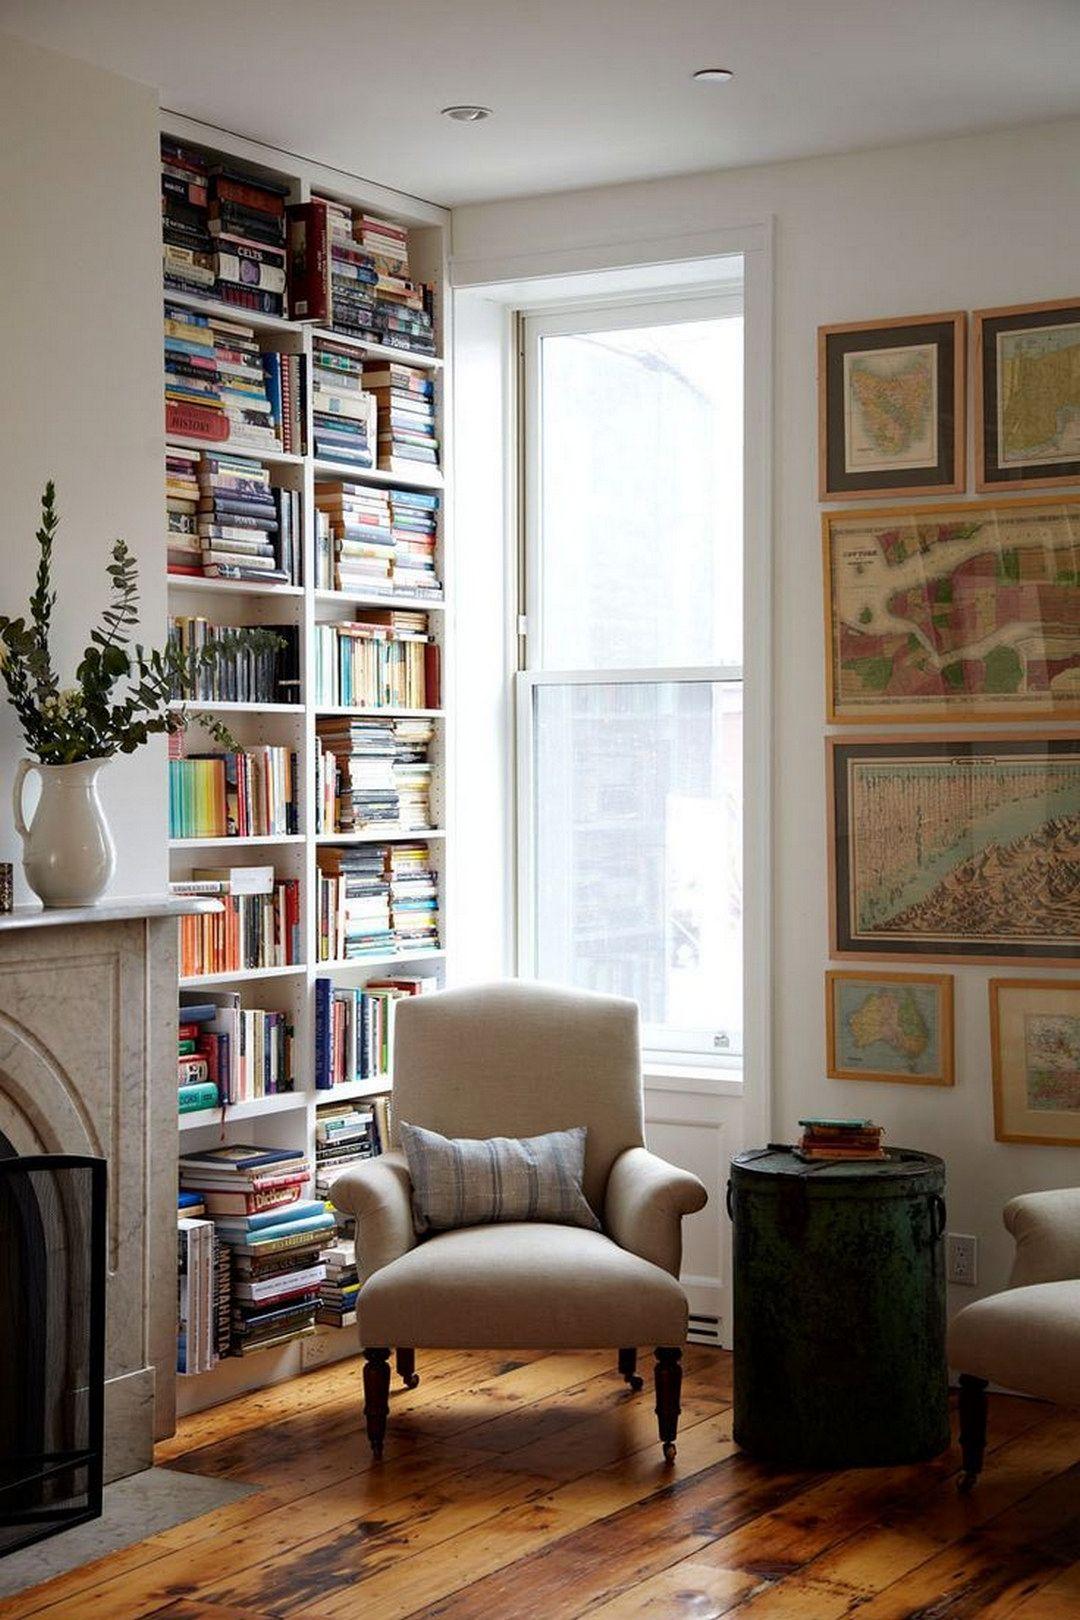 114 Cozy Reading Room Interior Ideas Https://www.futuristarchitecture.com/ Part 43